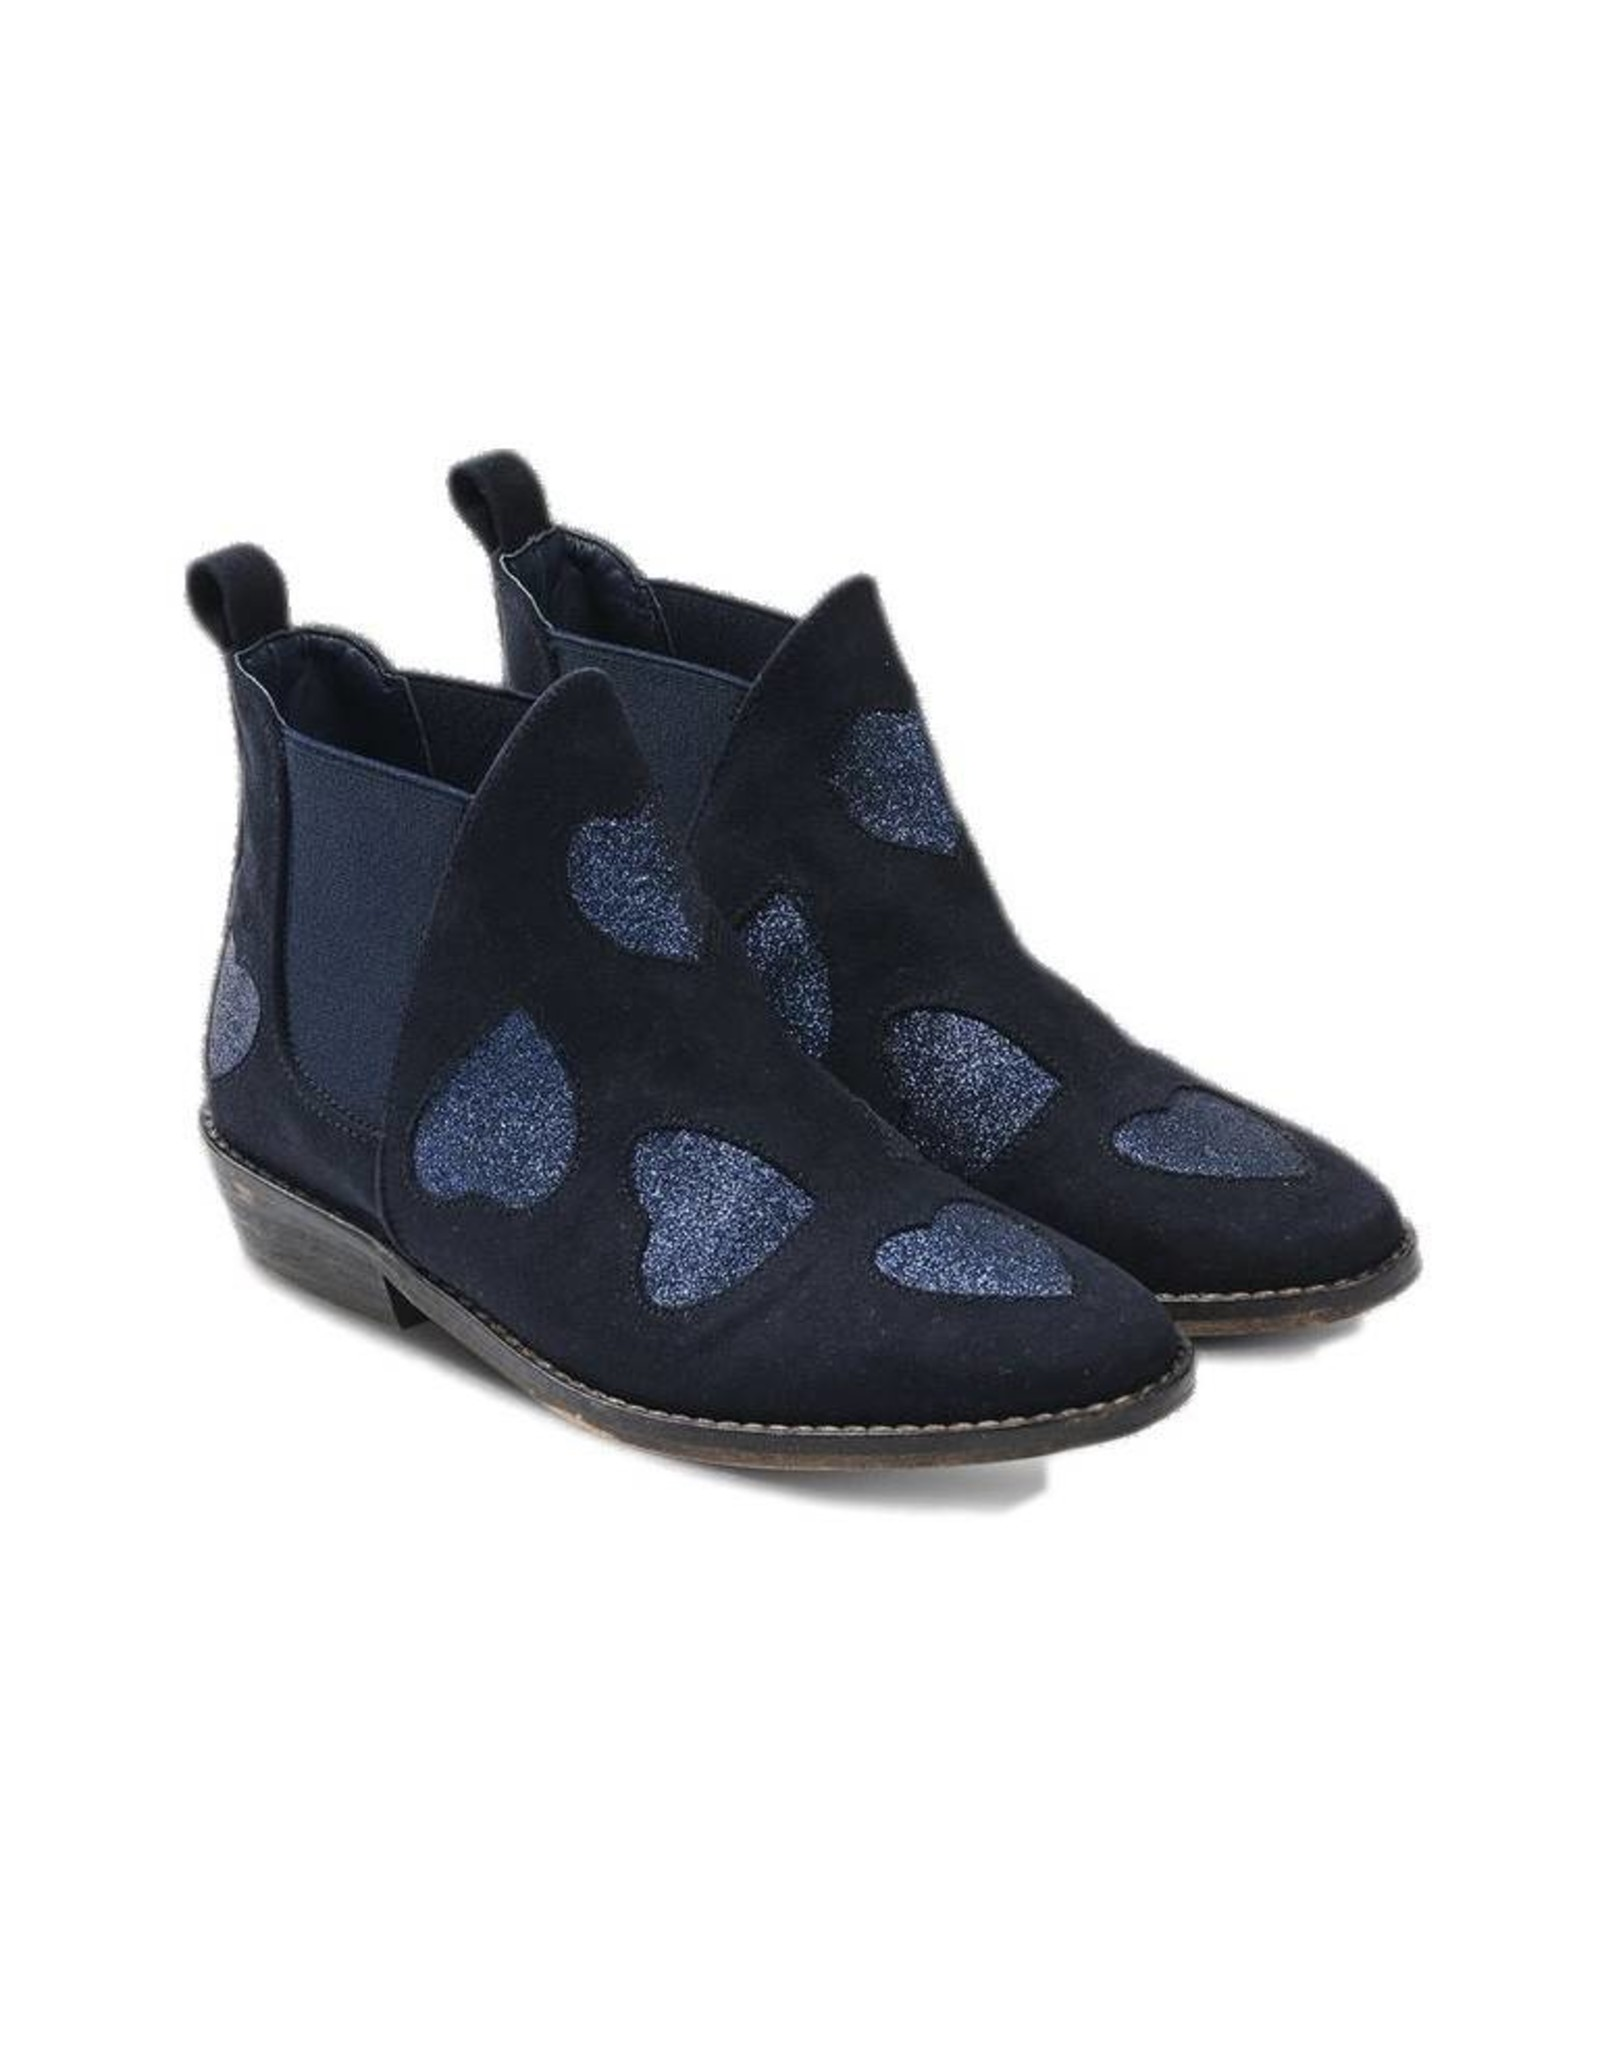 Stella McCartney Heart print boots